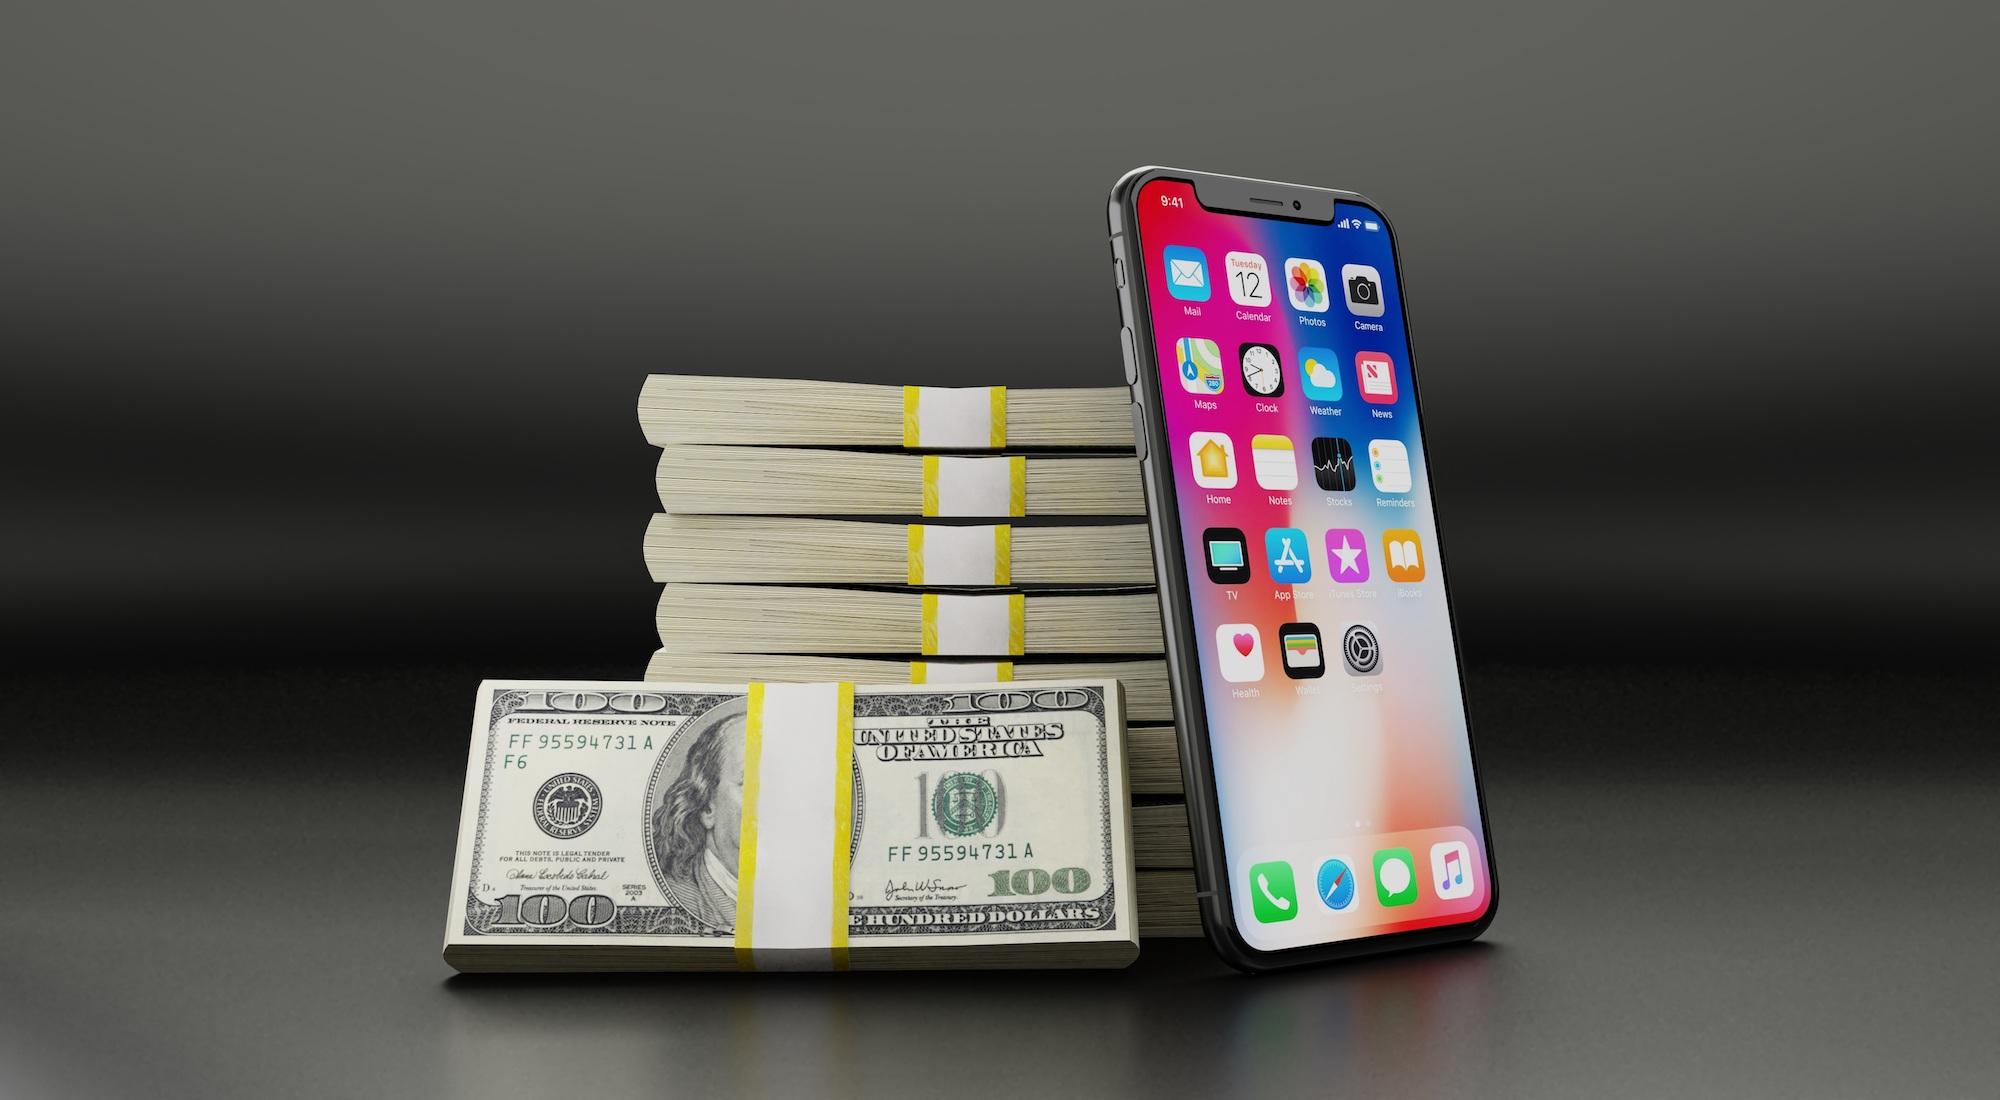 Apple's credit card codenamed